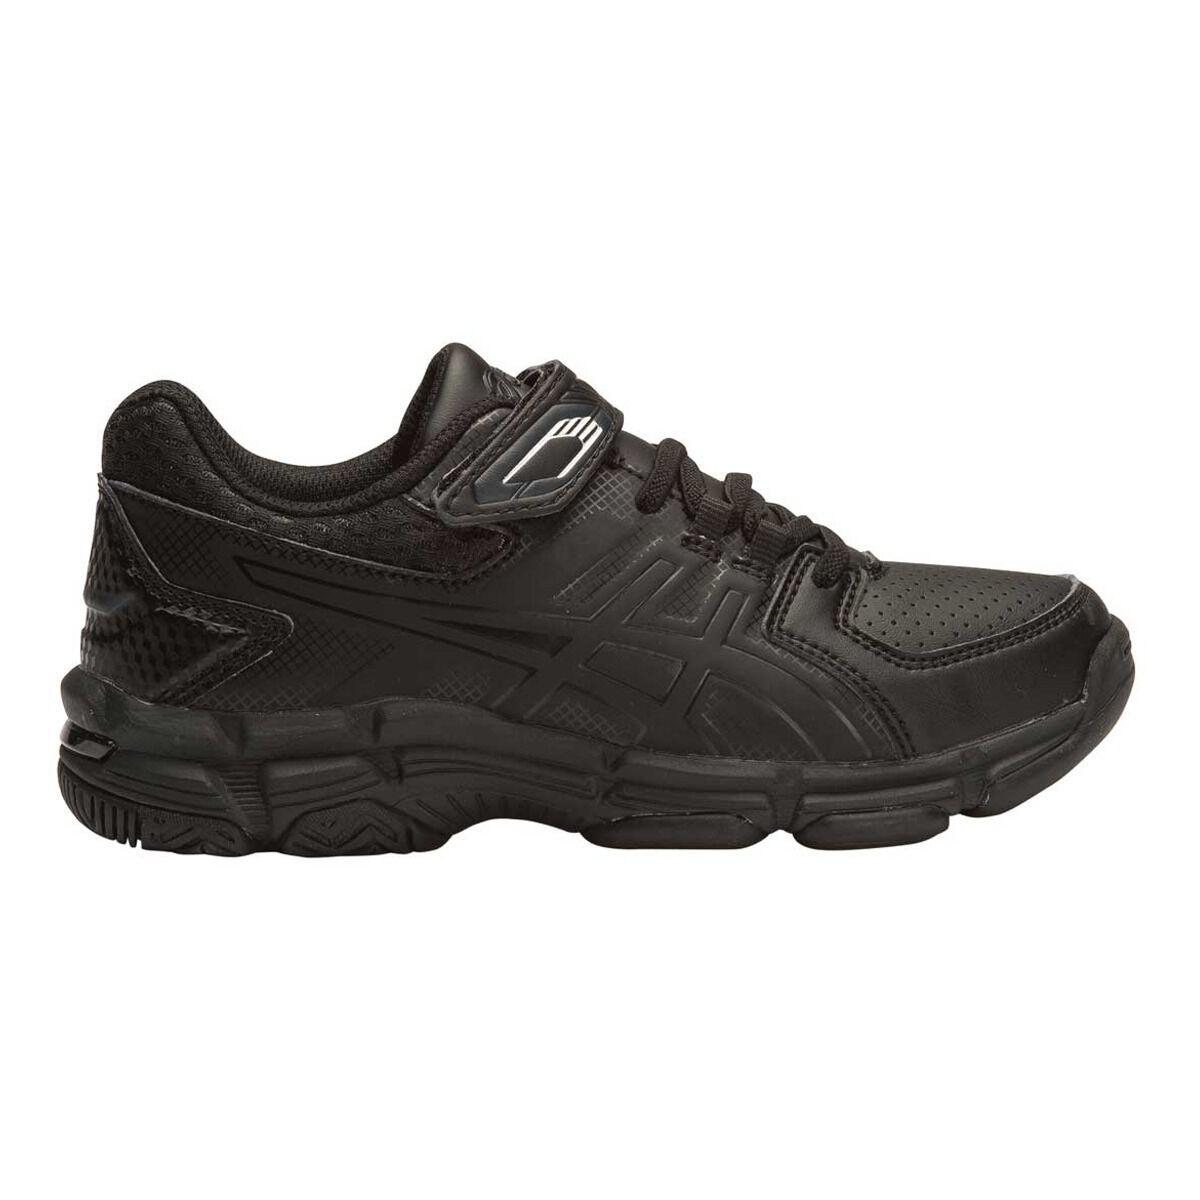 Asics Gel 540TR Leather Junior Cross Training Shoes White US 1